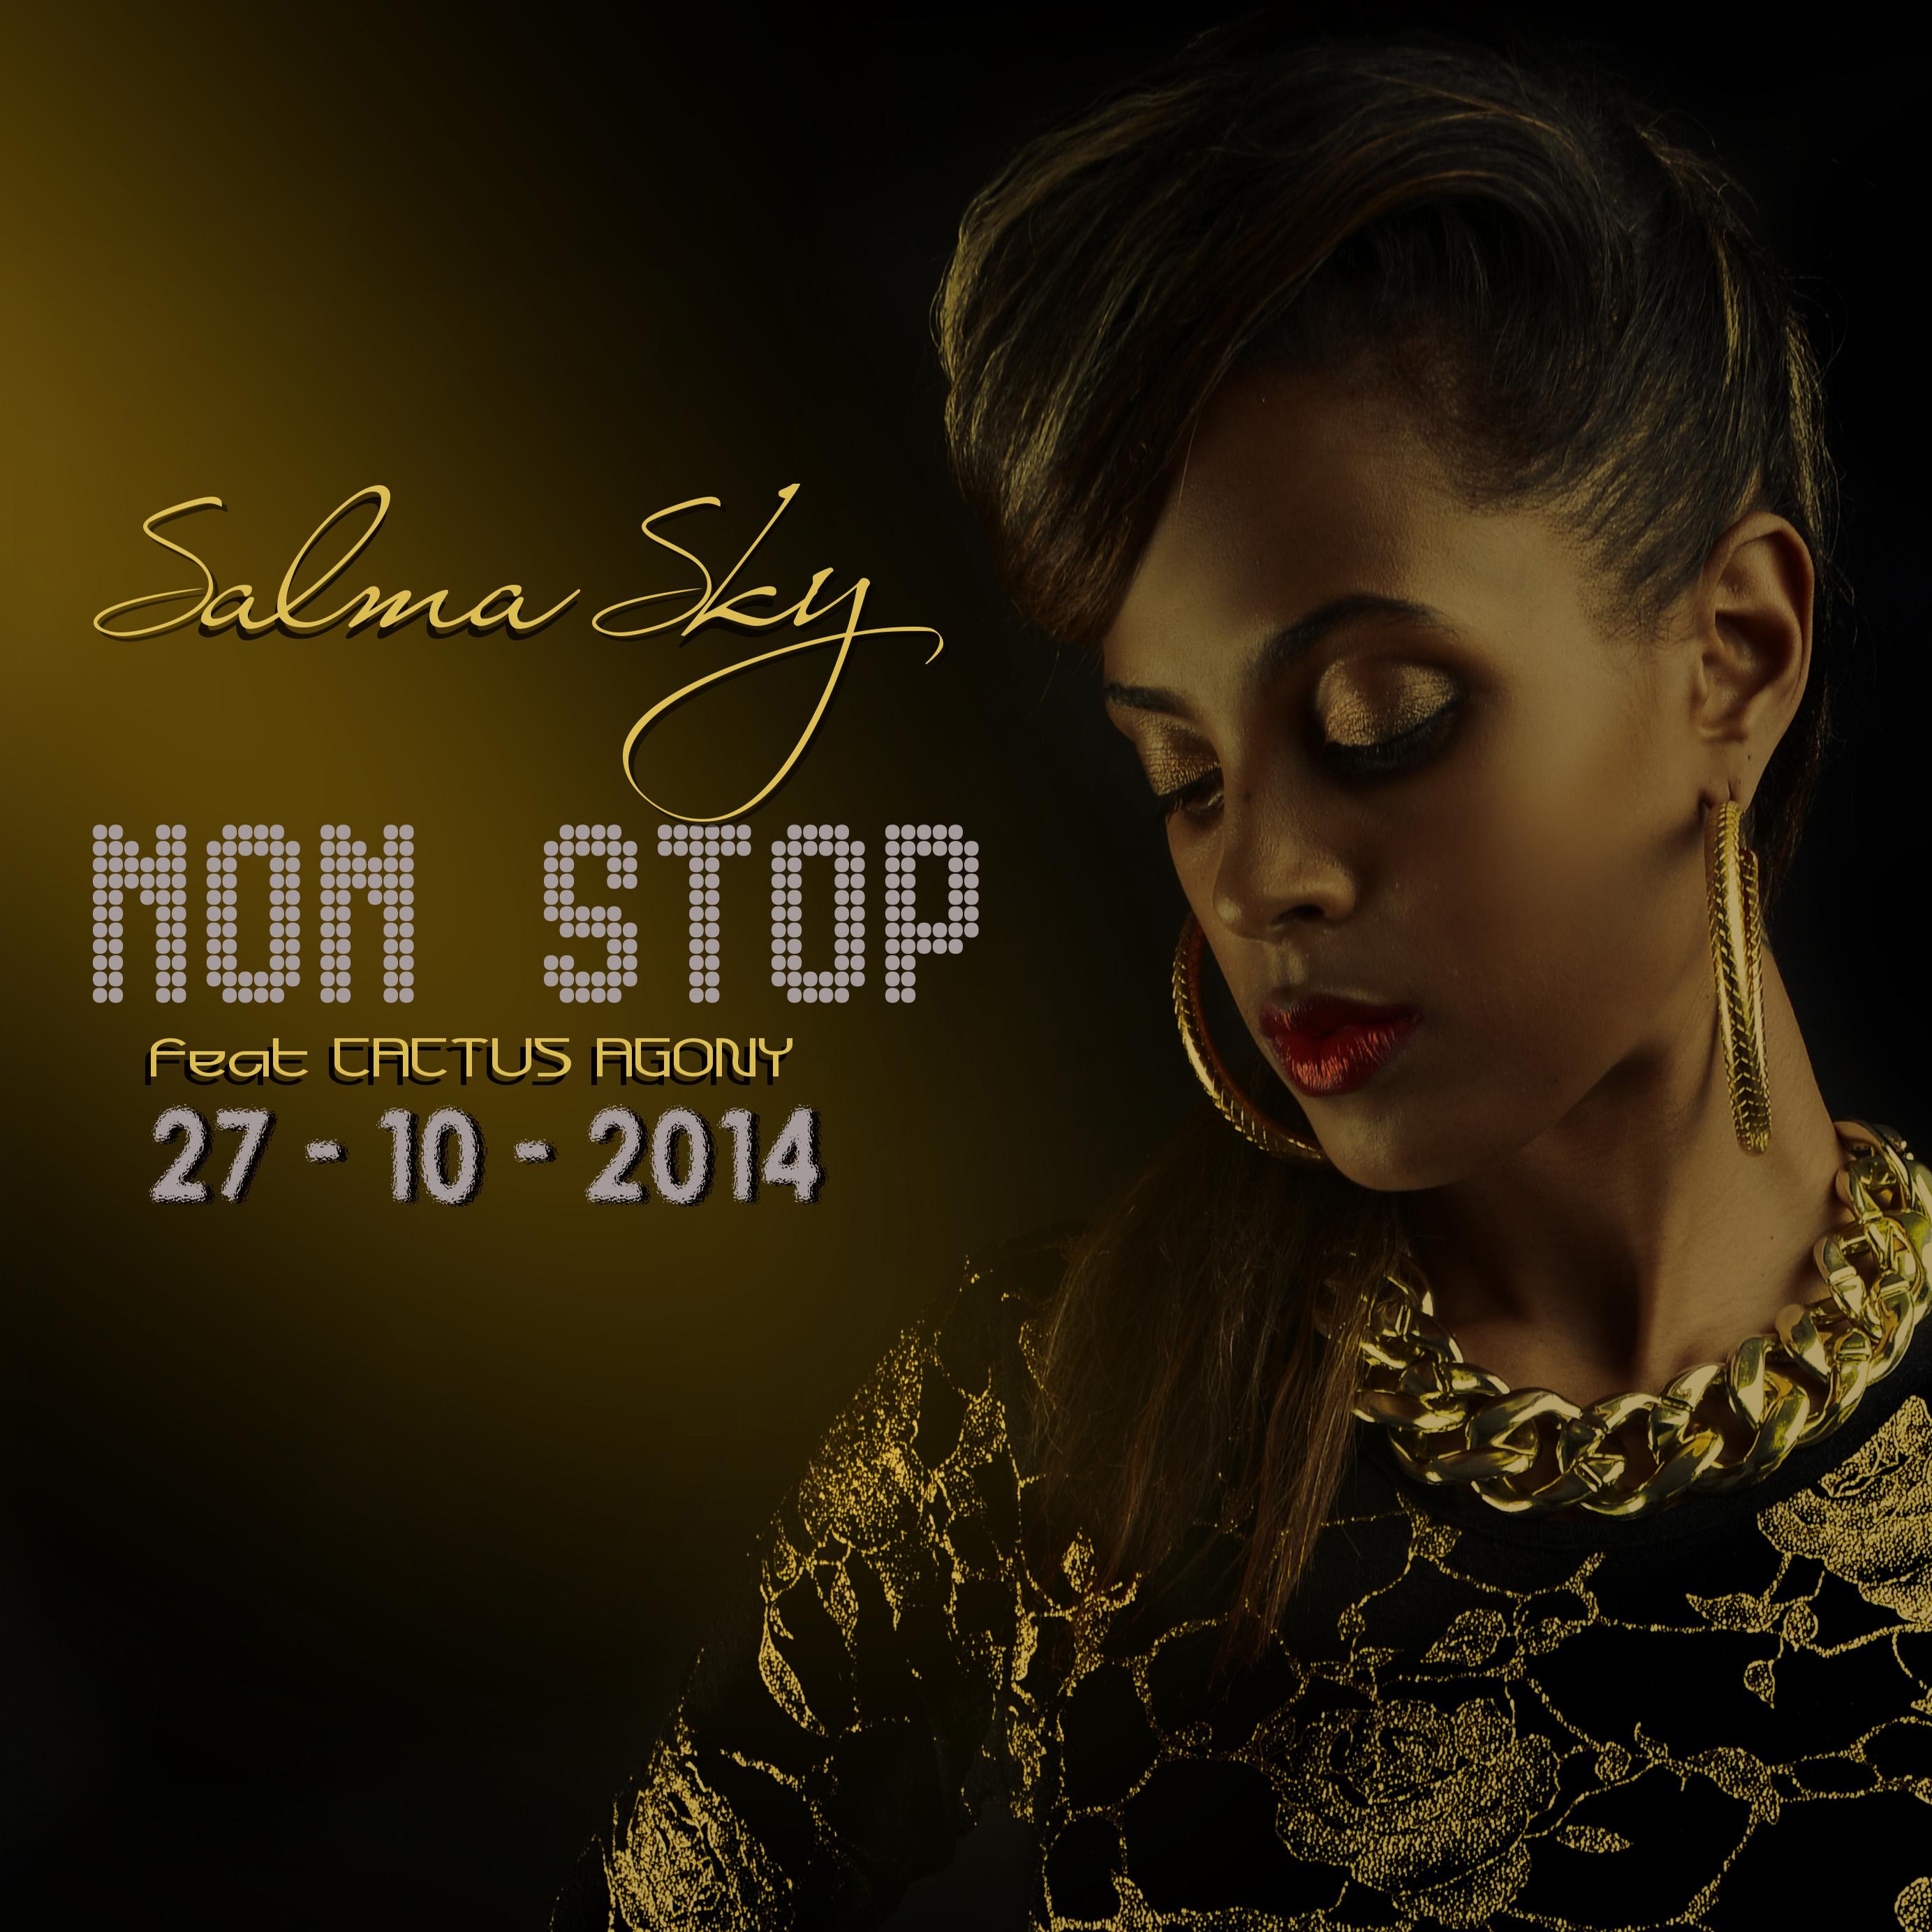 Salma Sky - Non Stop Ft. Cactus Agony